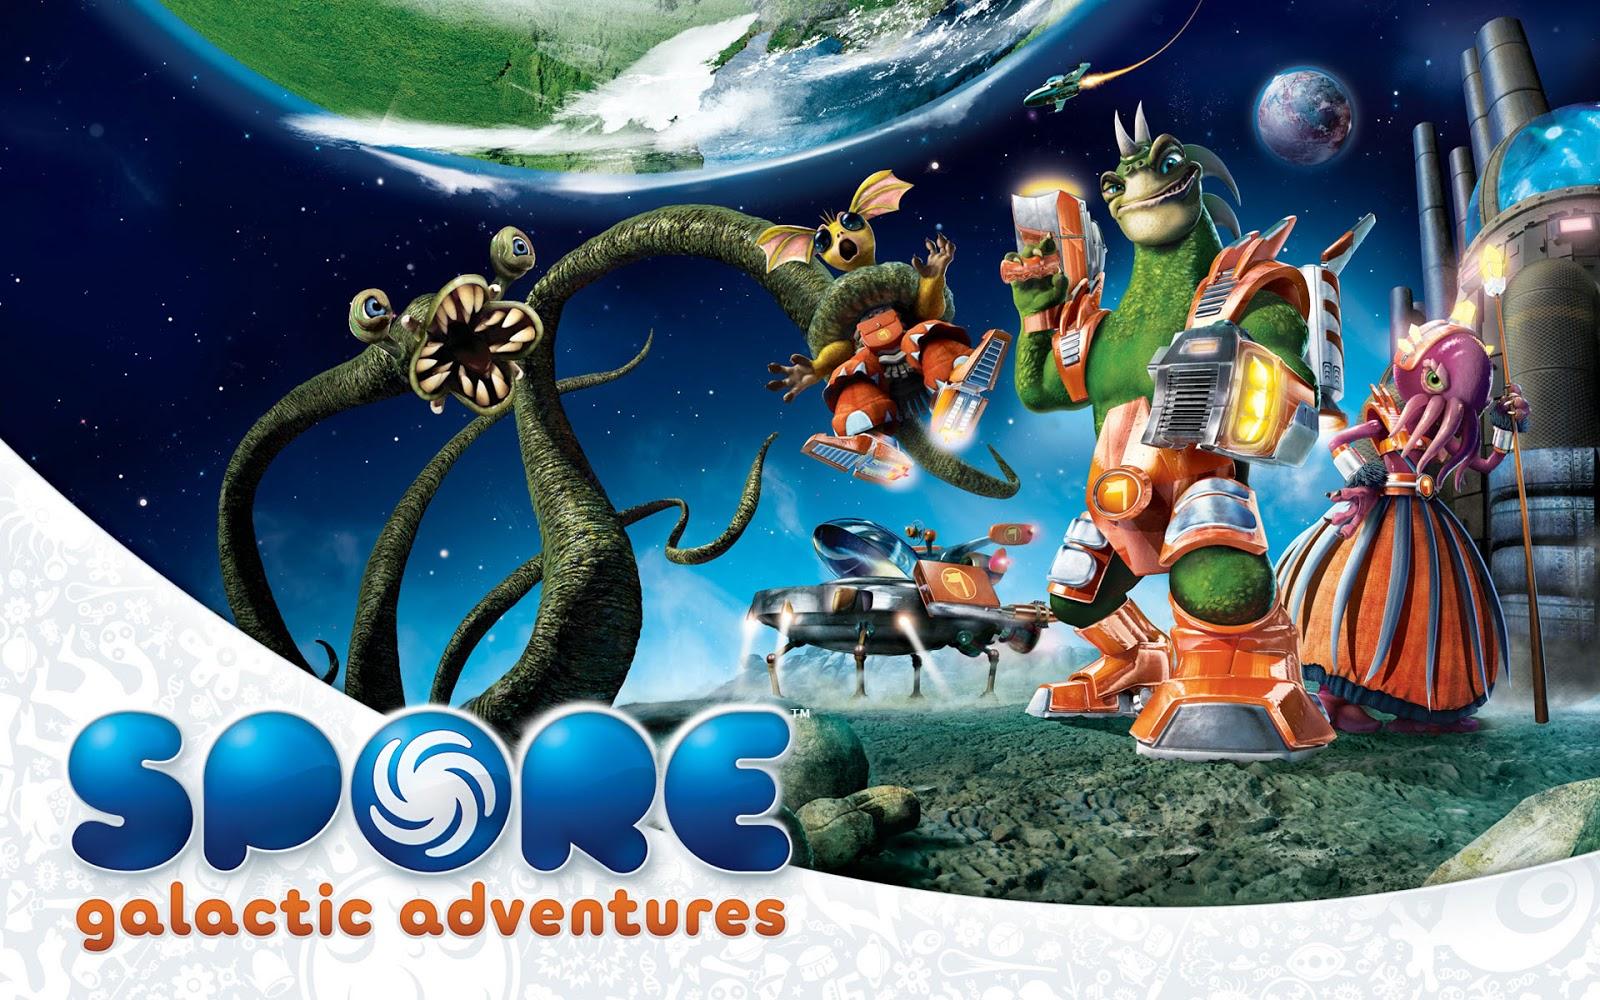 Adventure Game free Download at java 240x320 jar Gameloft